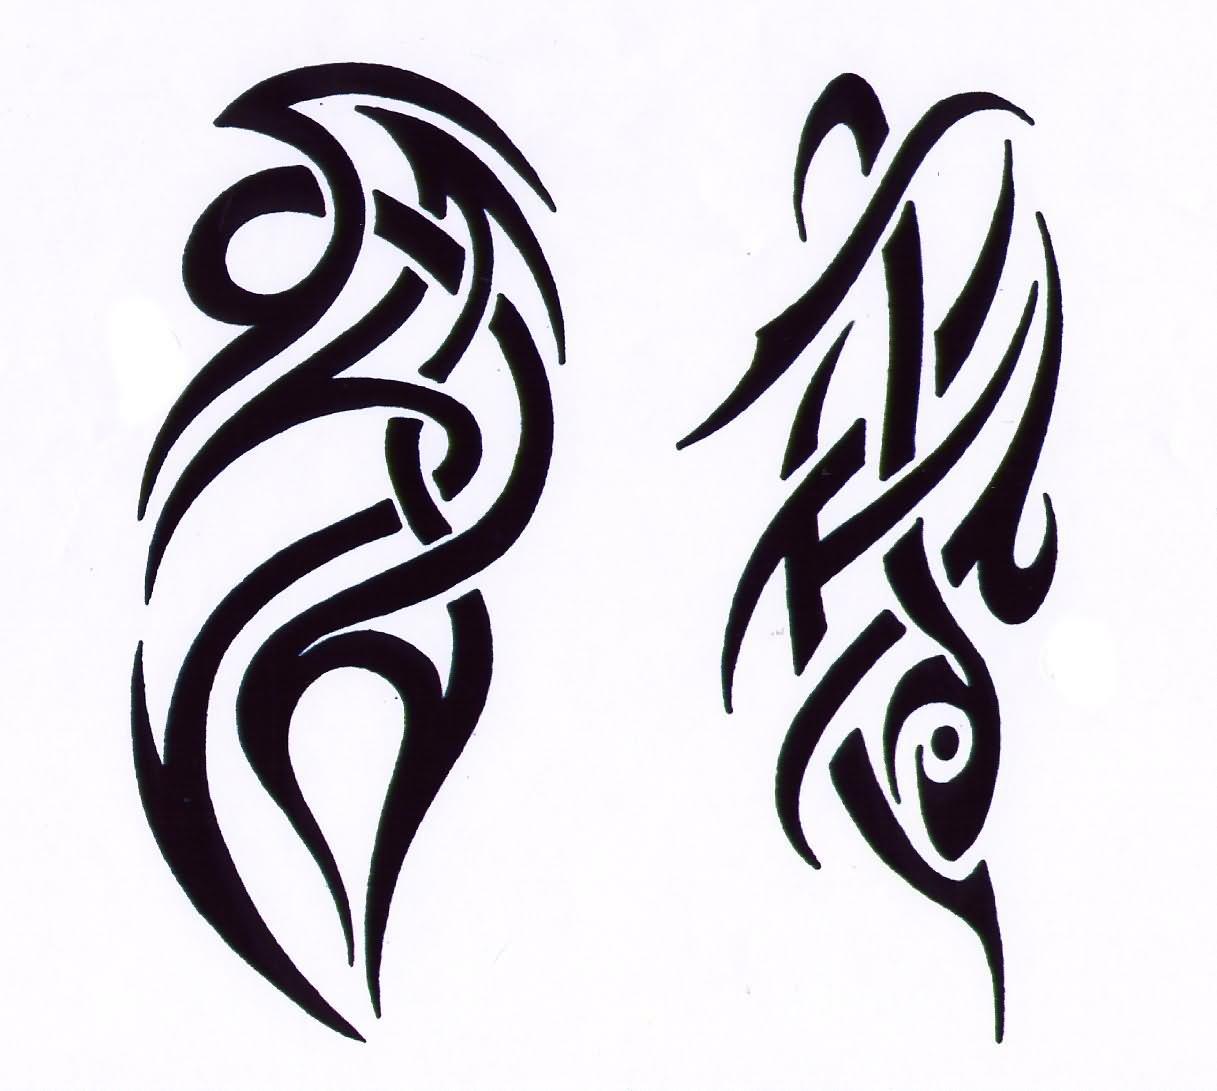 Tribal-Tattoos Tribal-Tattoos-Designs-For-Men